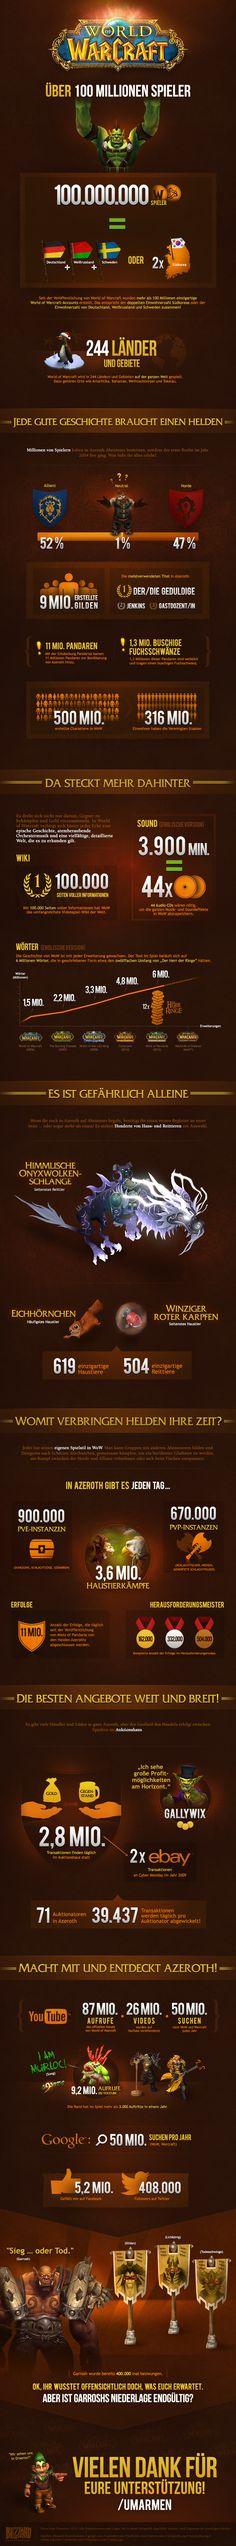 World of Warcraft: Infografik - Blizzard Entertainment